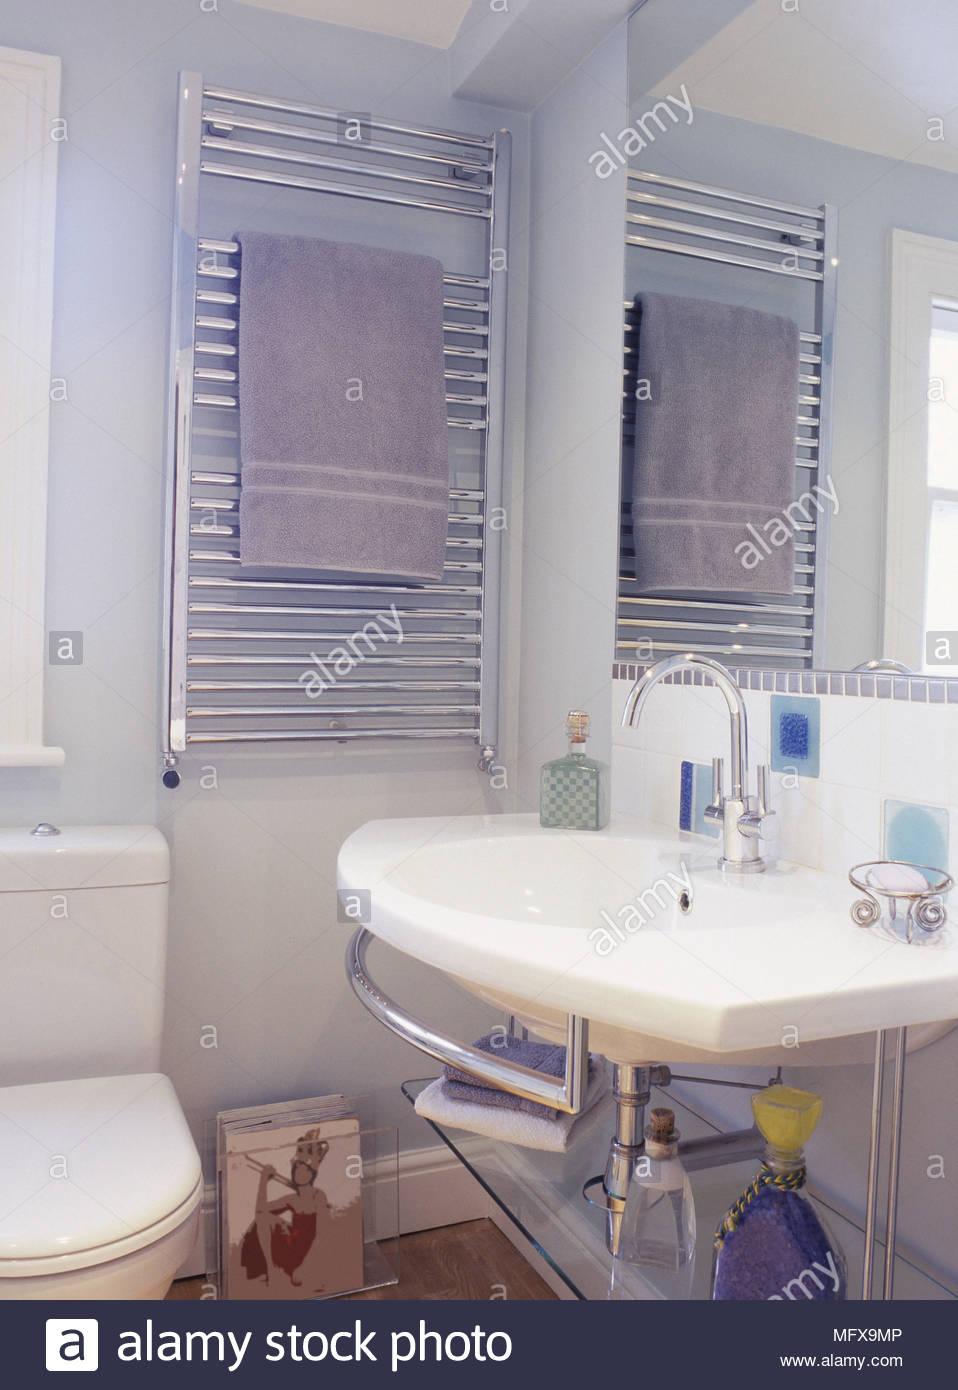 Full Size of Handtuchhalter Heizkörper Badezimmer Bad Küche Elektroheizkörper Für Wohnzimmer Wohnzimmer Handtuchhalter Heizkörper